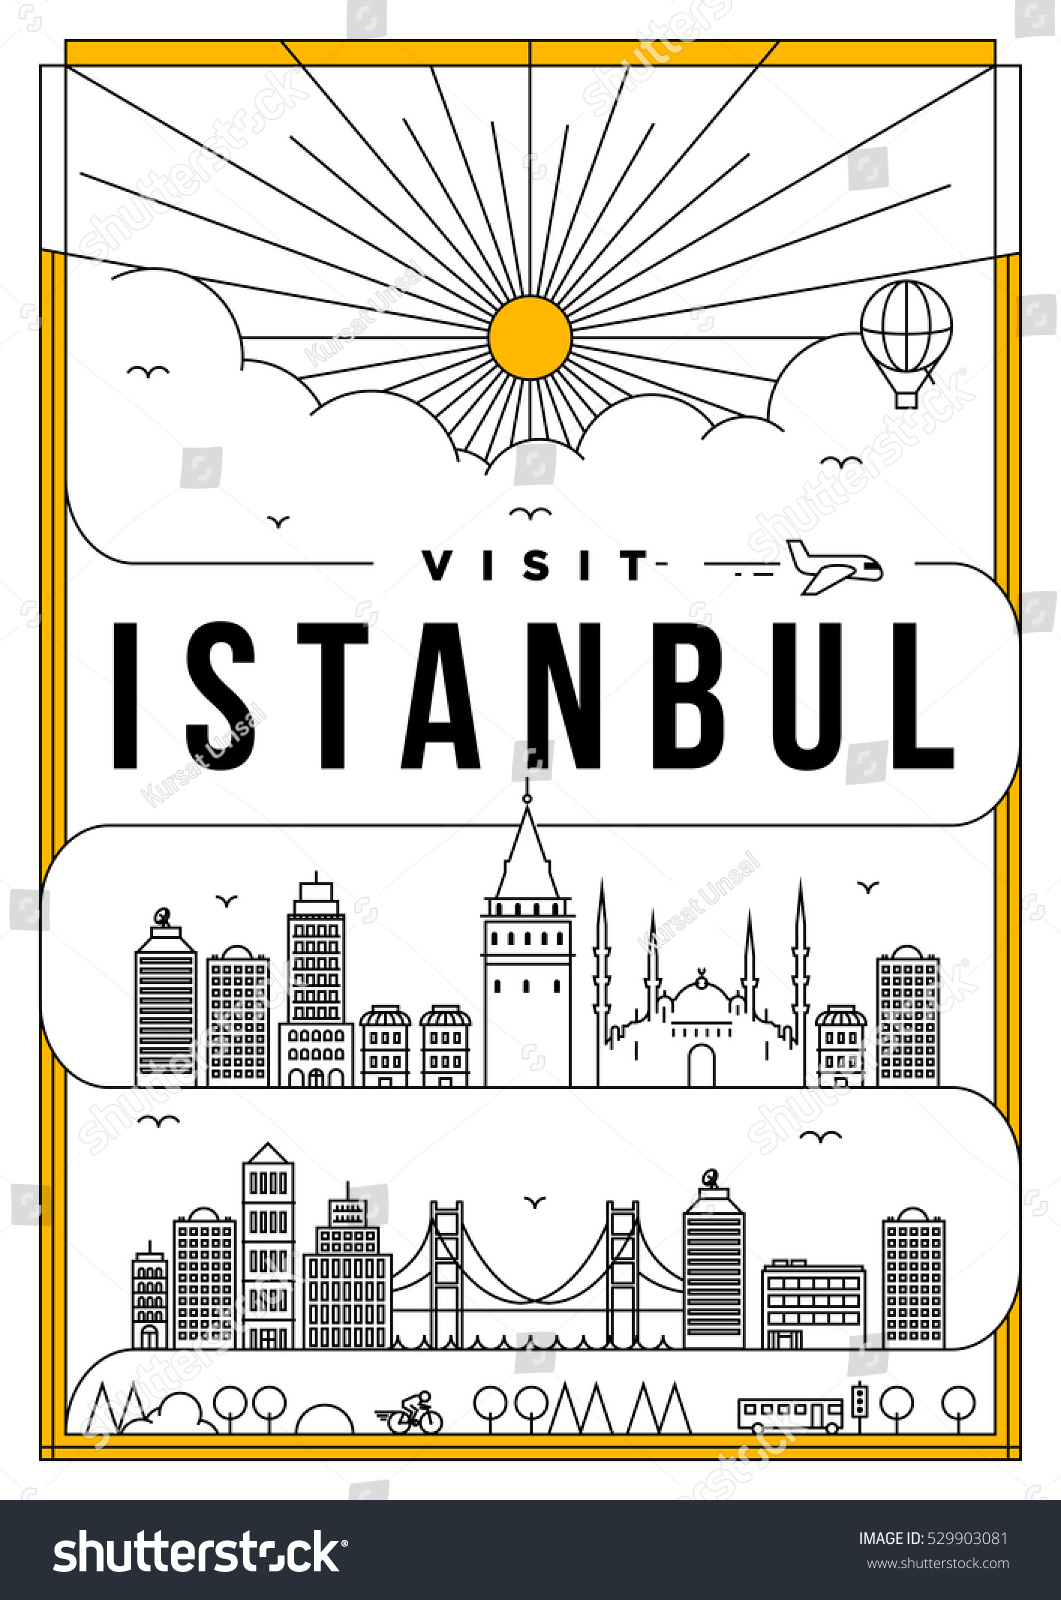 D d poster design - Linear Travel Istanbul Poster Design